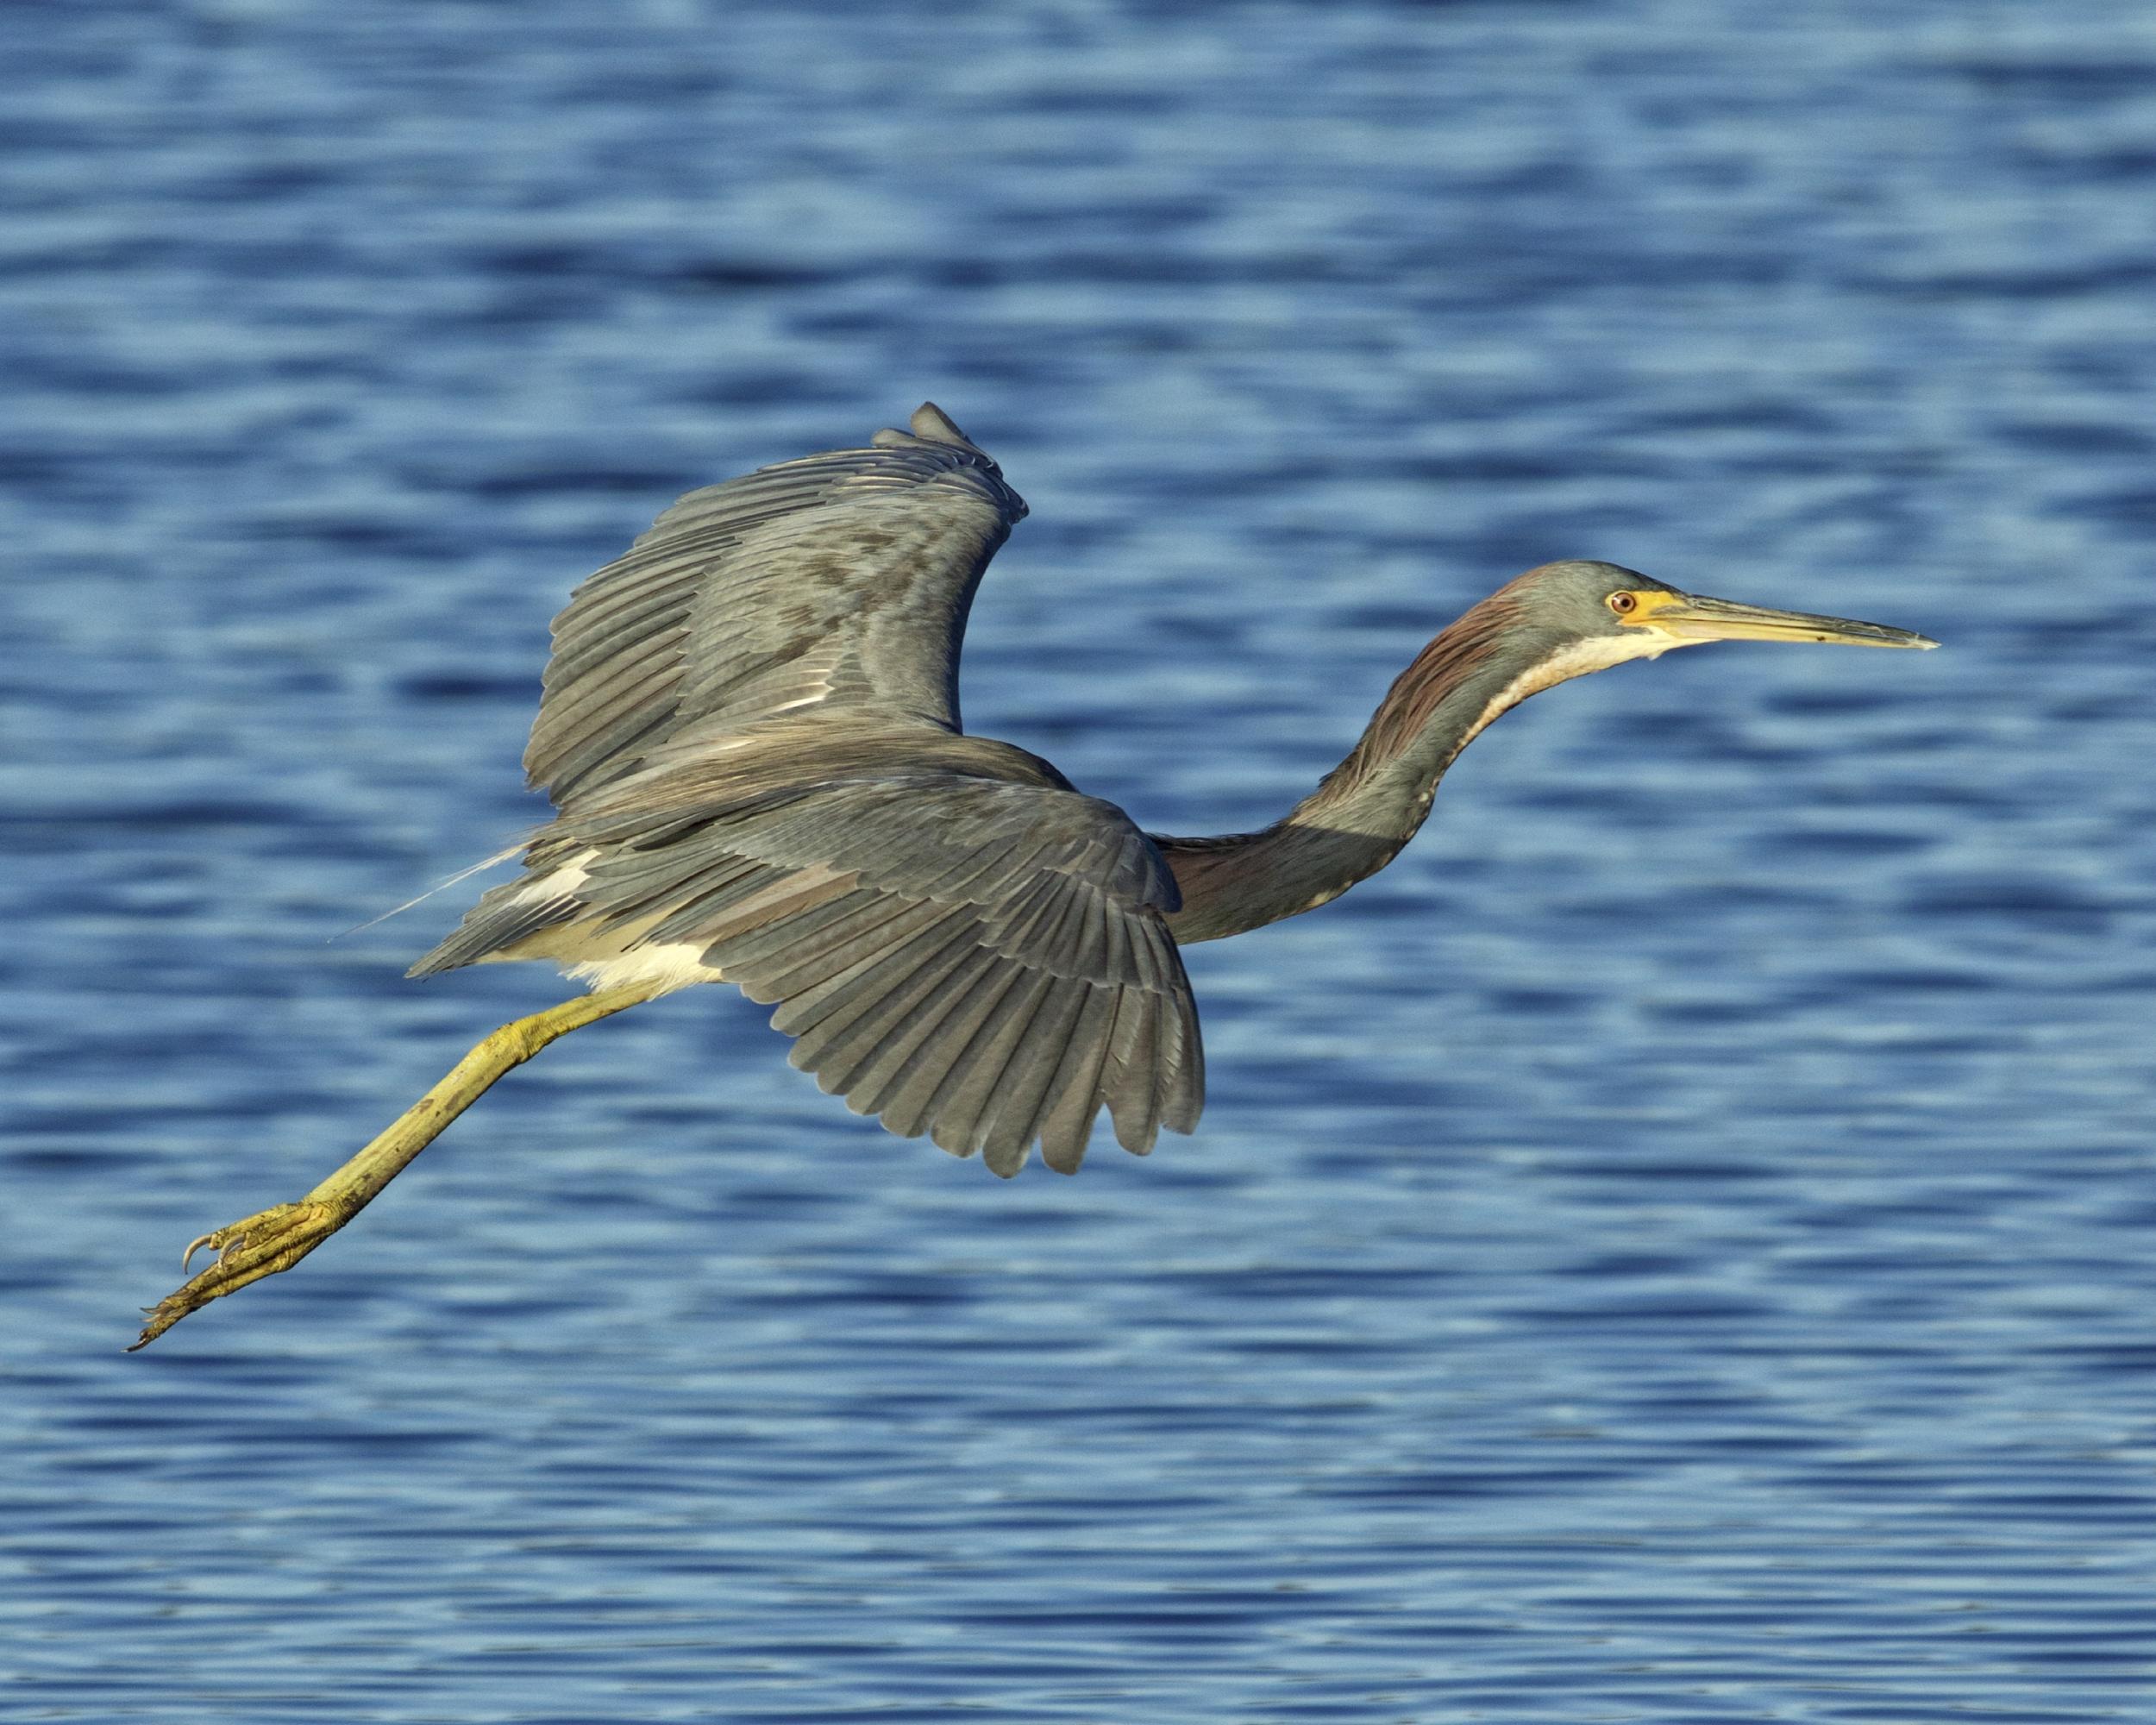 Each bird is unique in its flight..